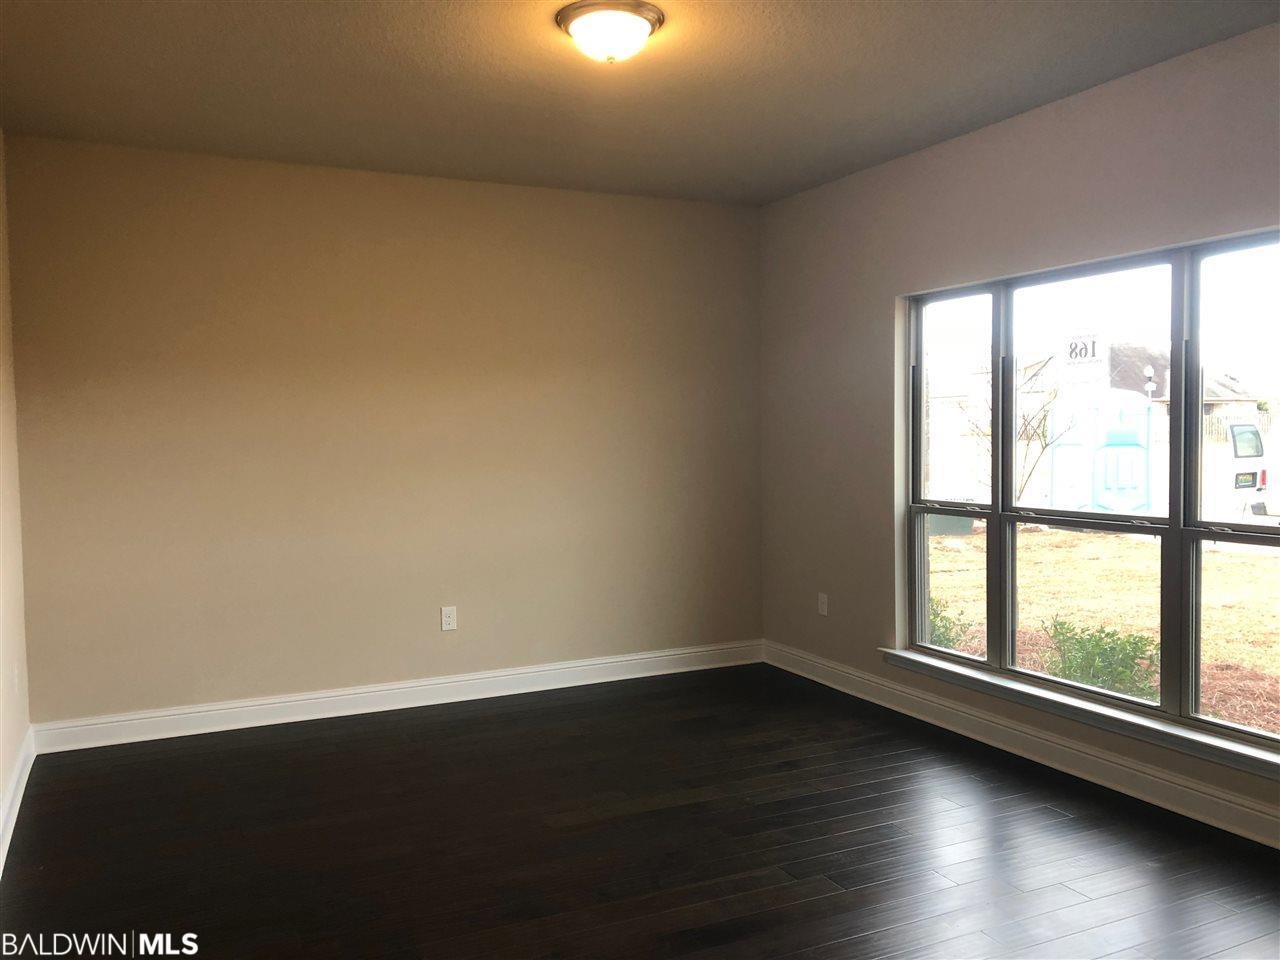 9795 Bellaton Avenue, Daphne, AL 36526